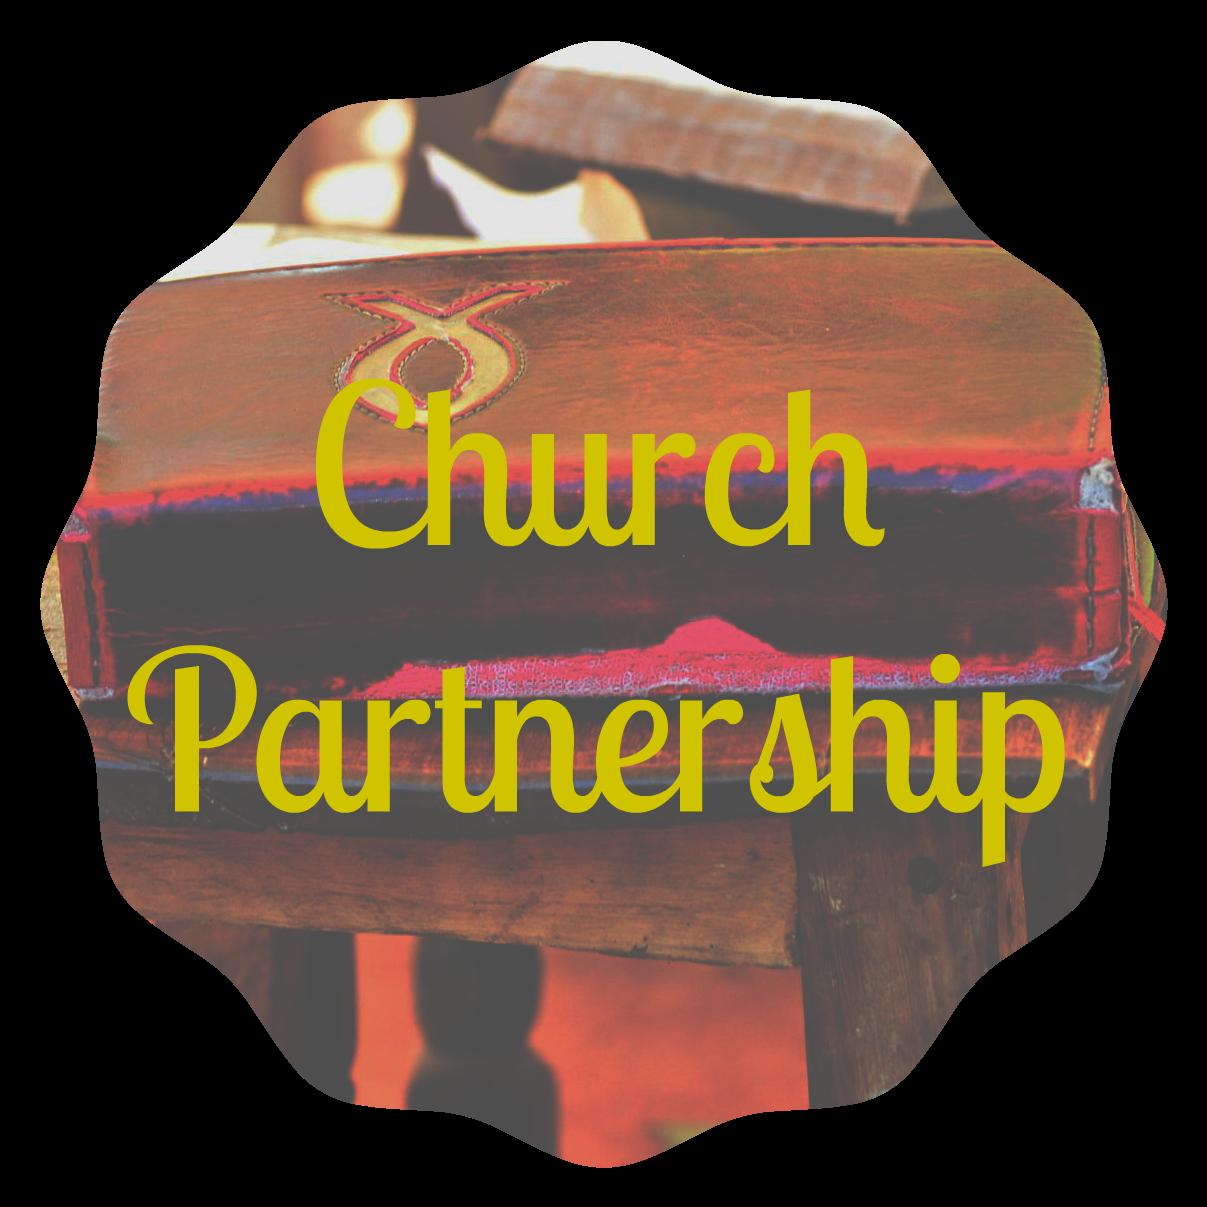 church partnership circle.png